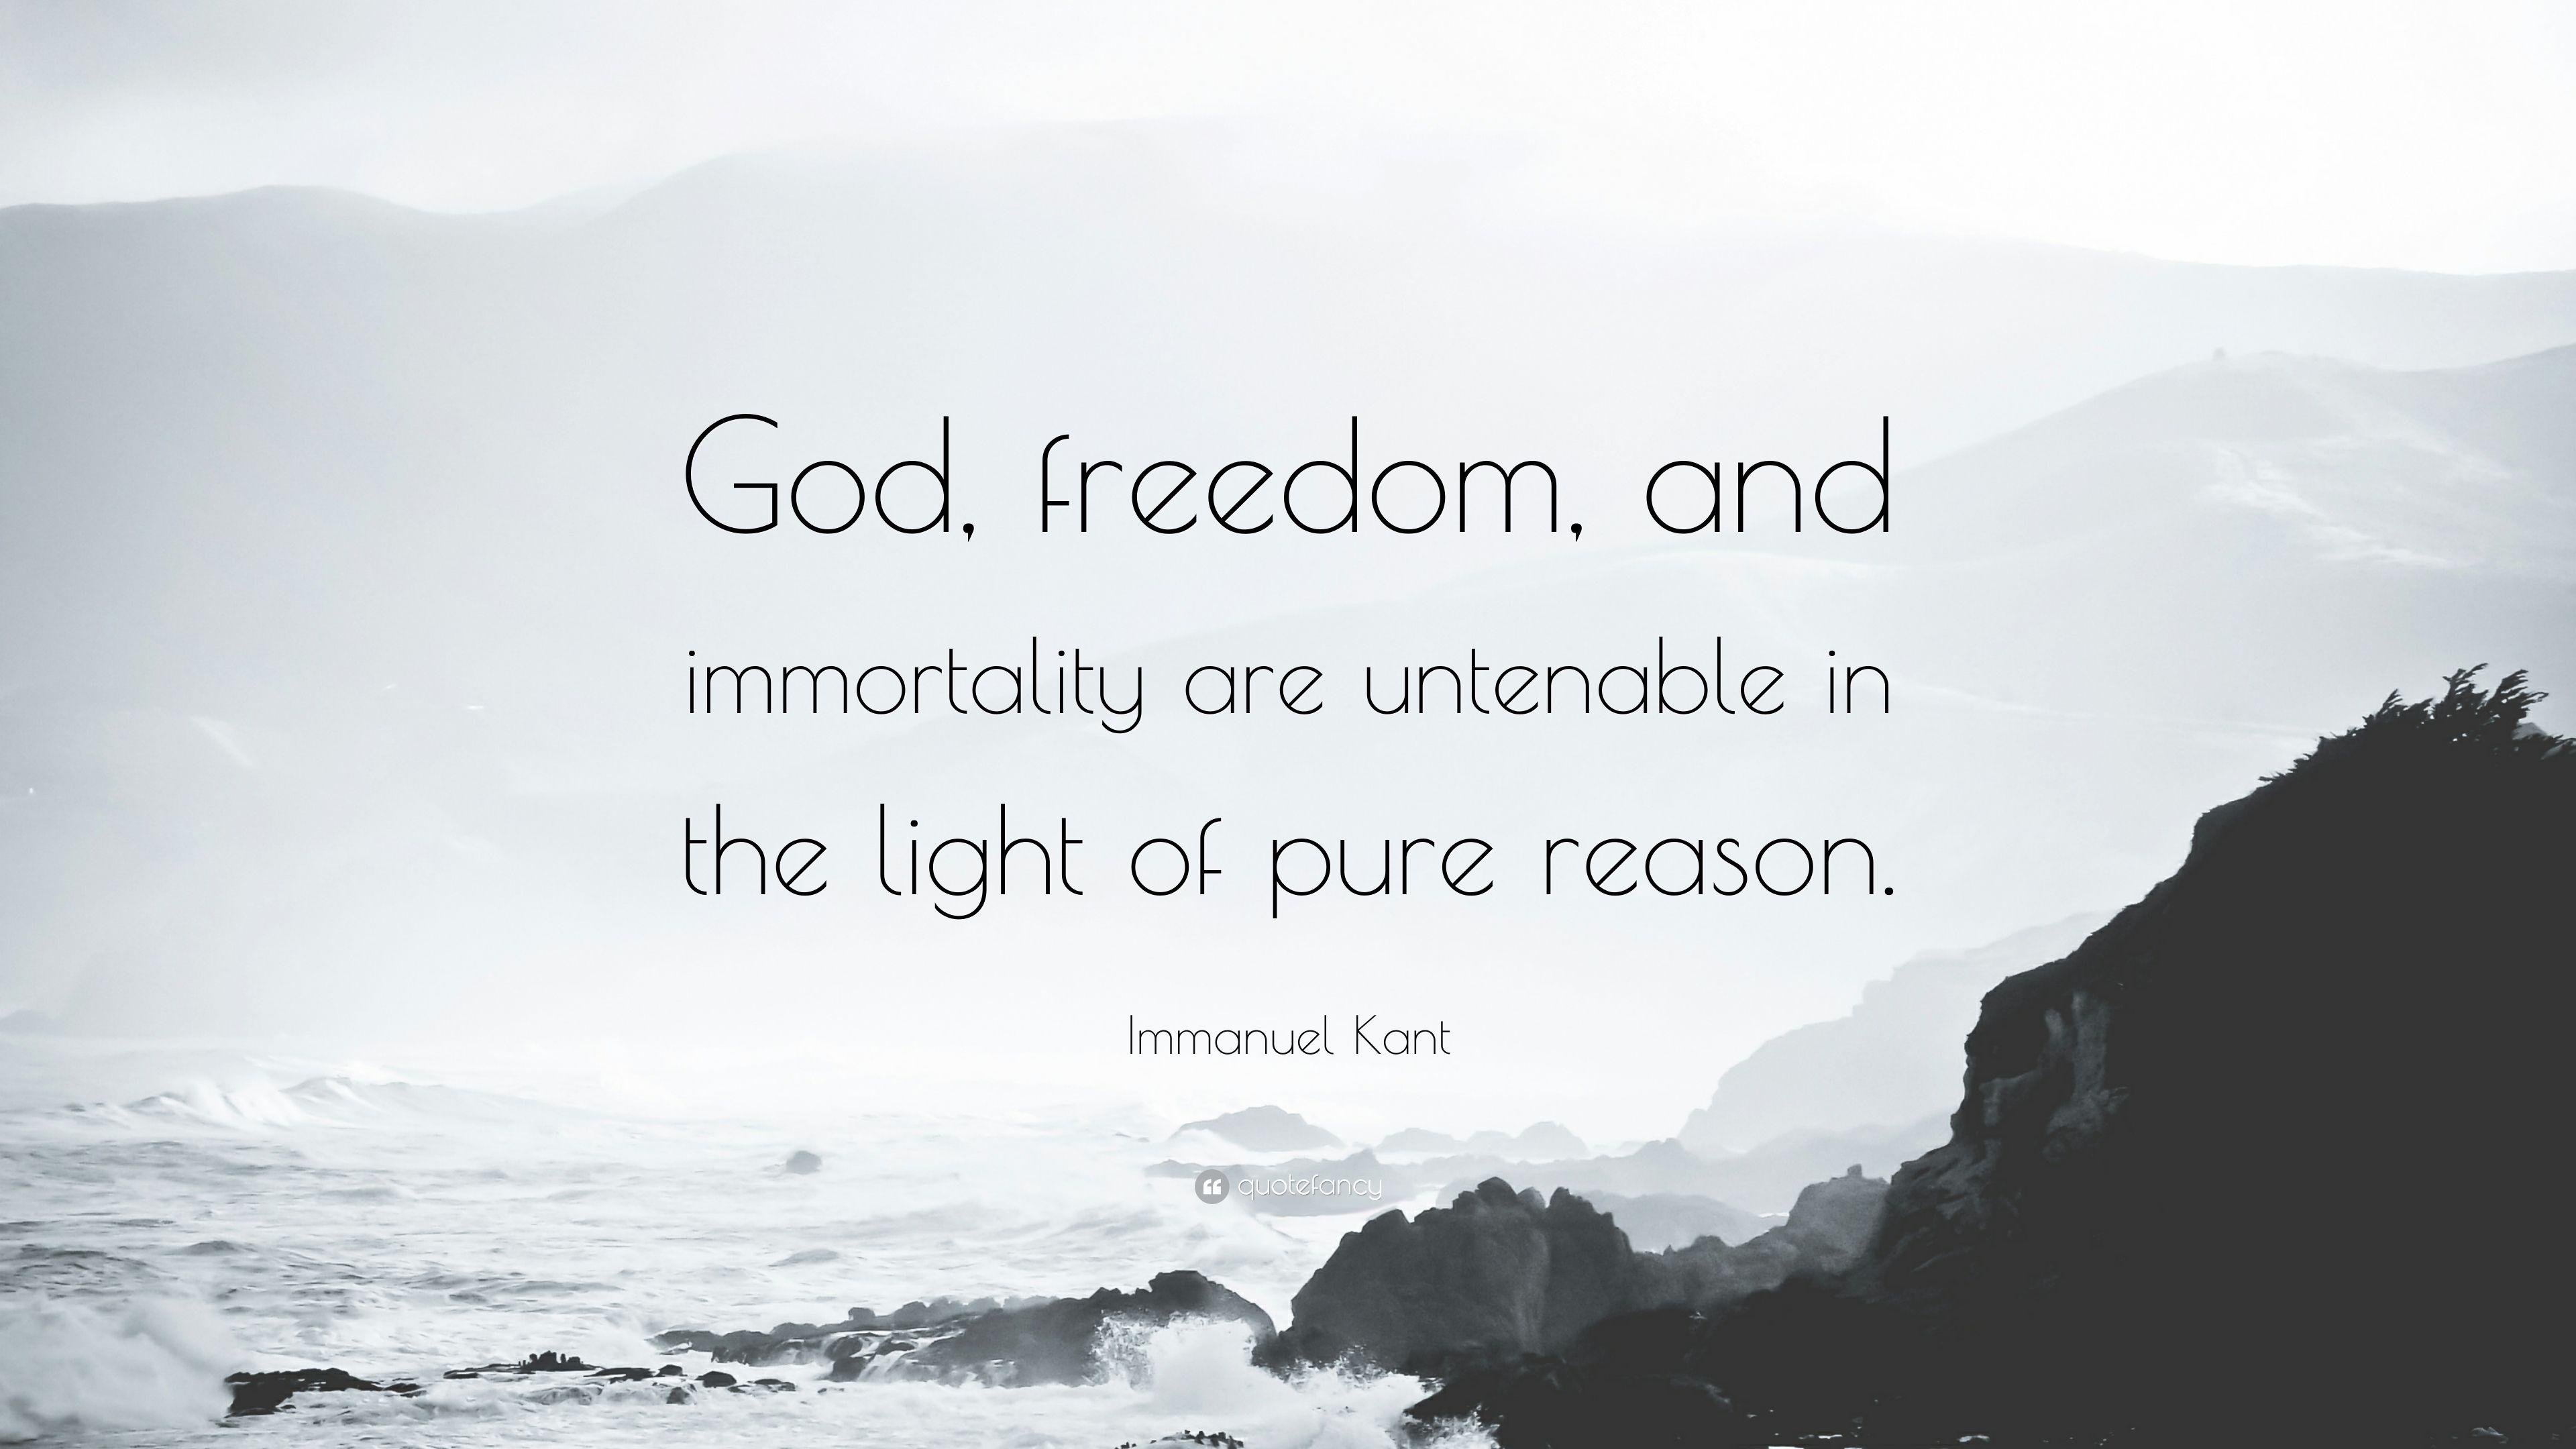 kant quote inspire philospohy genius life motivation wisdom 3840x2160